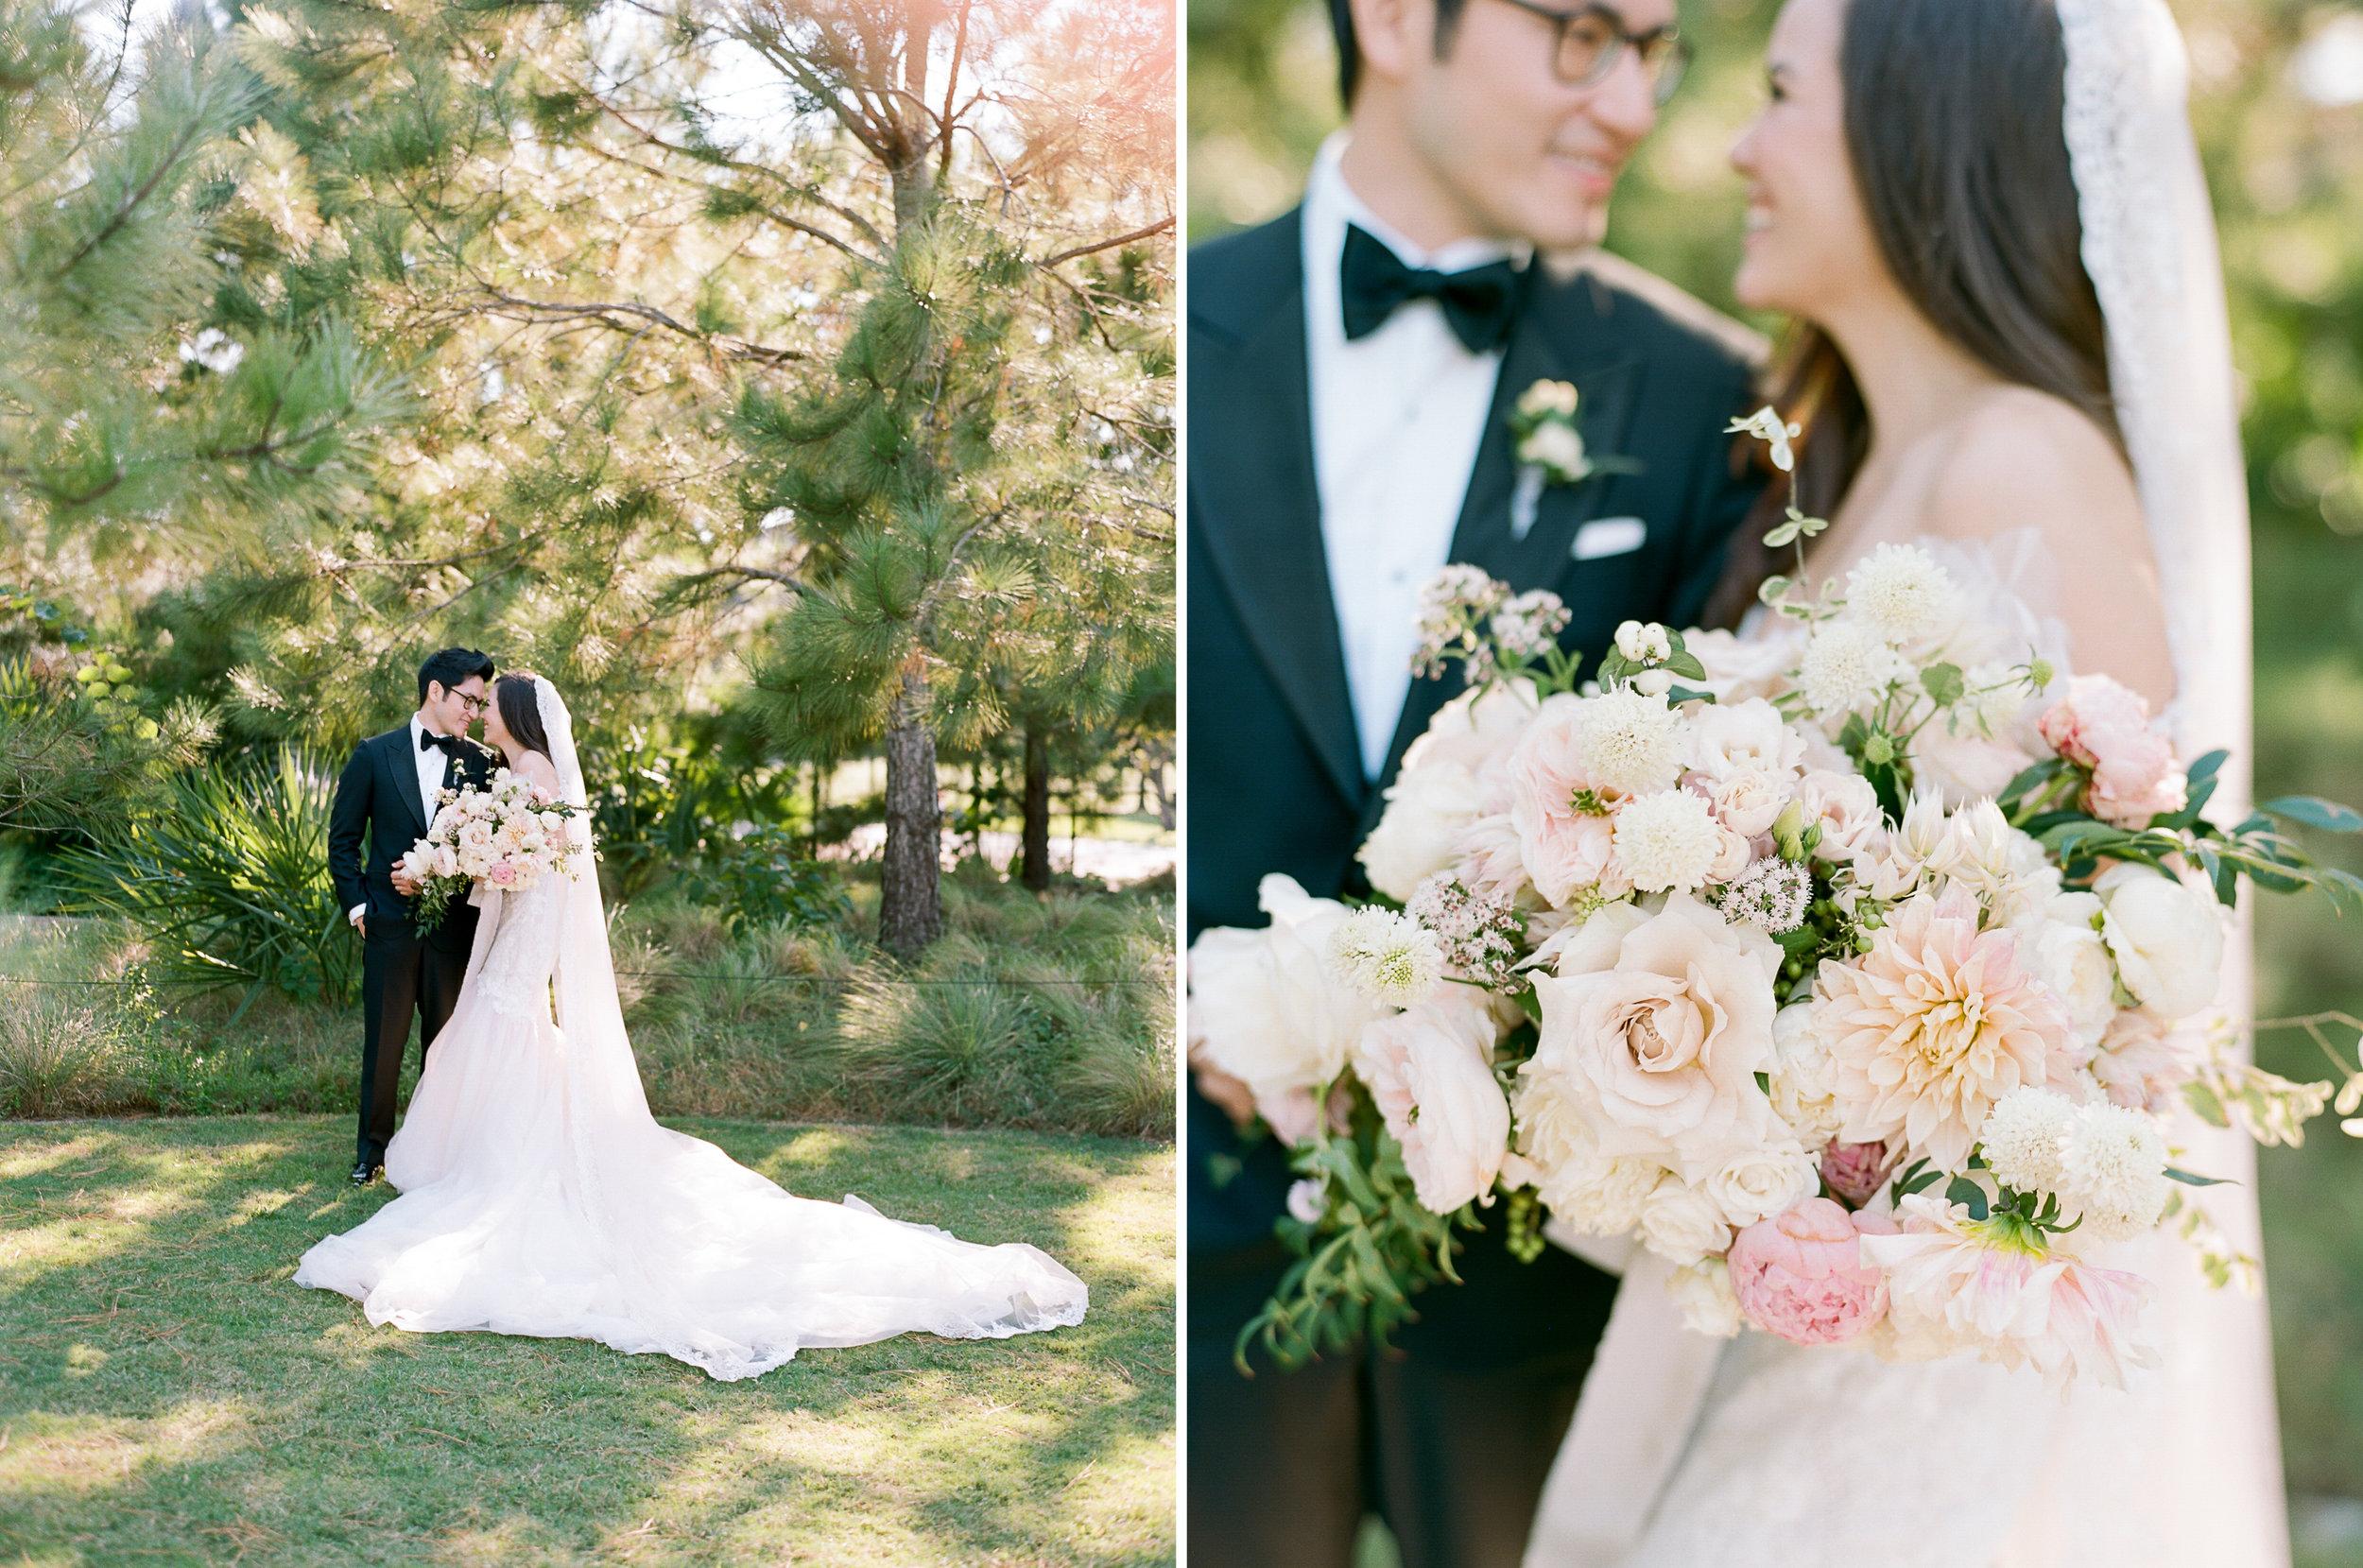 Martha-Stewart-Wedding-Dana-Fernandez-Photography-Josh-Texas-Film-Houston-Wedding-Fine-Art-Photographer-McGovern-Centennial-Gardens-Top-Best-301.jpg